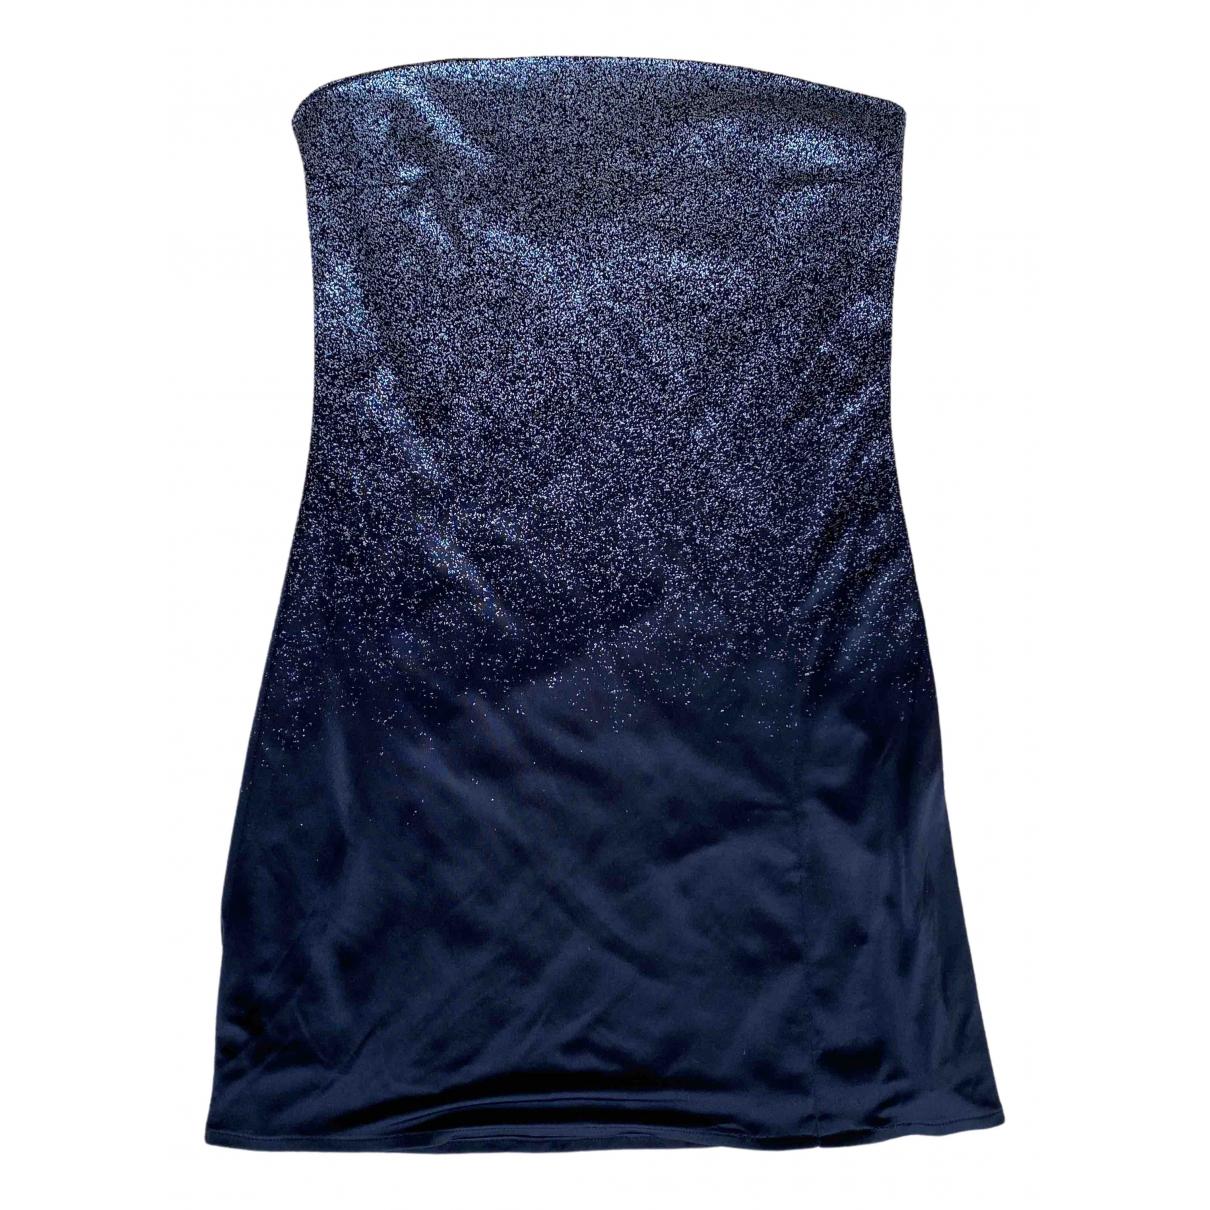 Versus \N Black dress for Women 40 FR